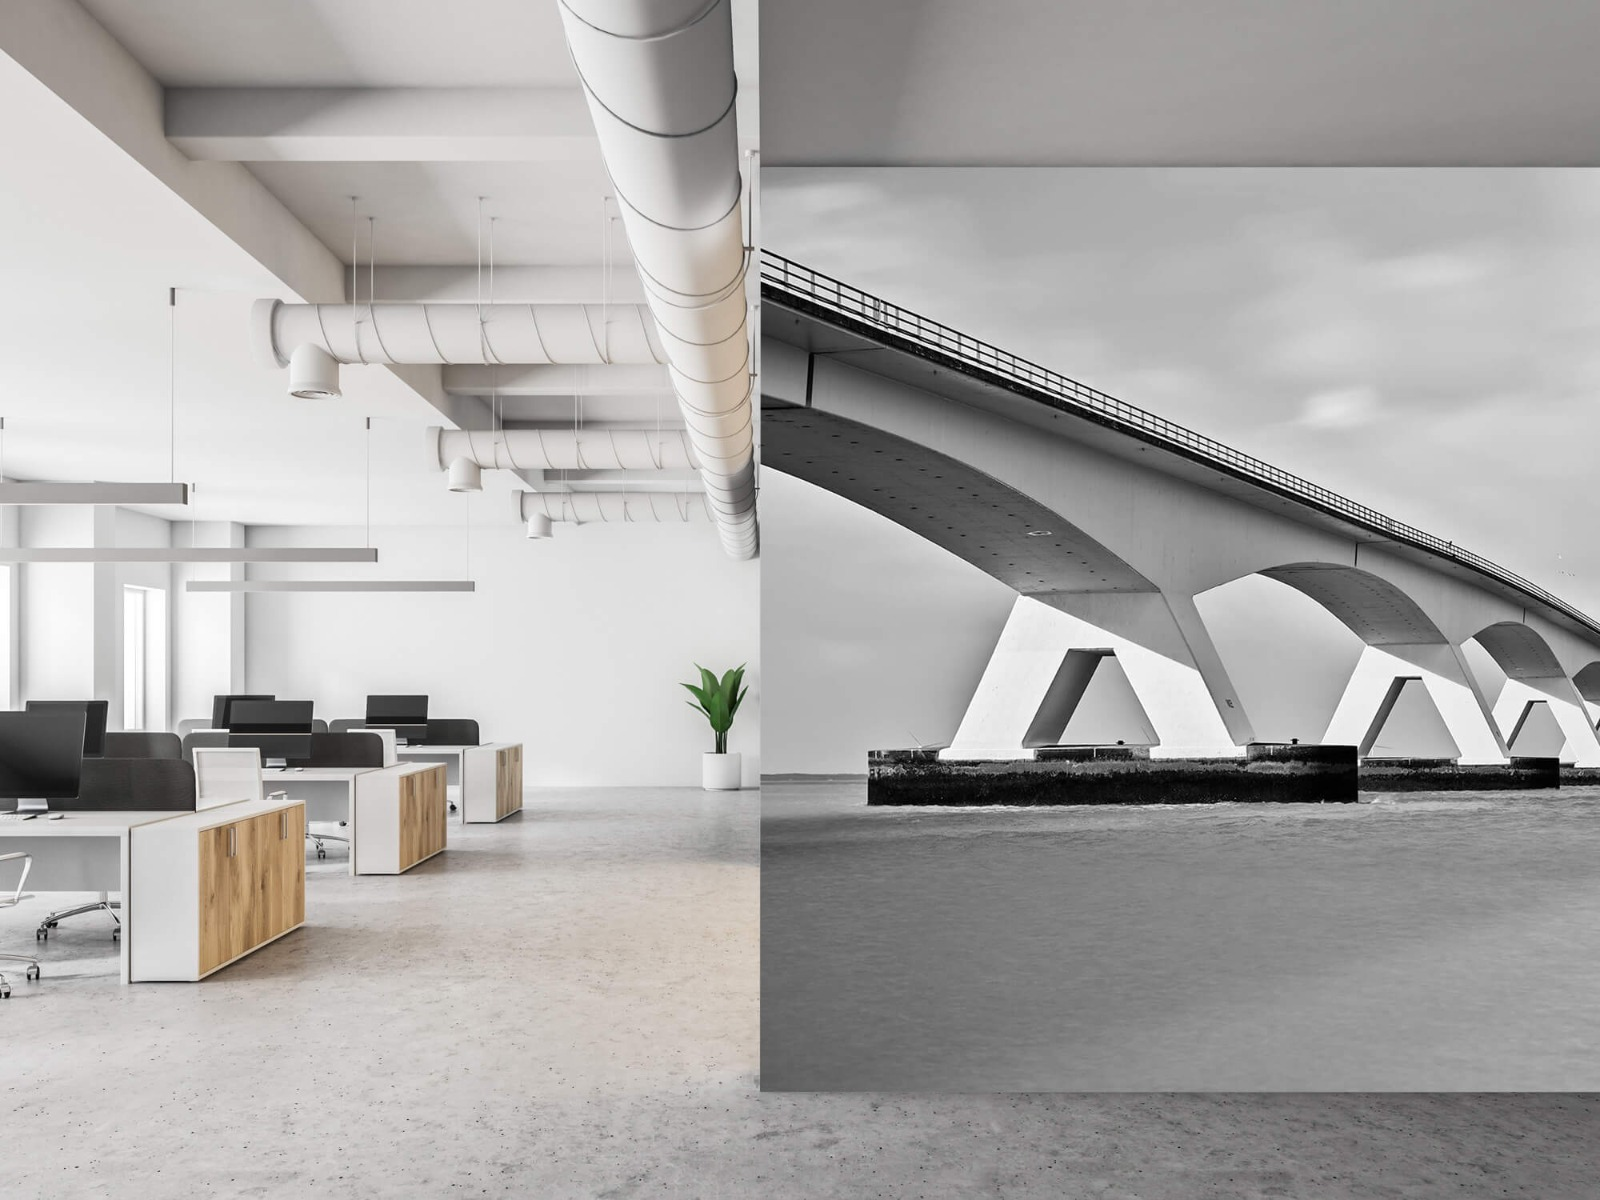 Zwart Wit behang - Lange brug - Kantoor 21